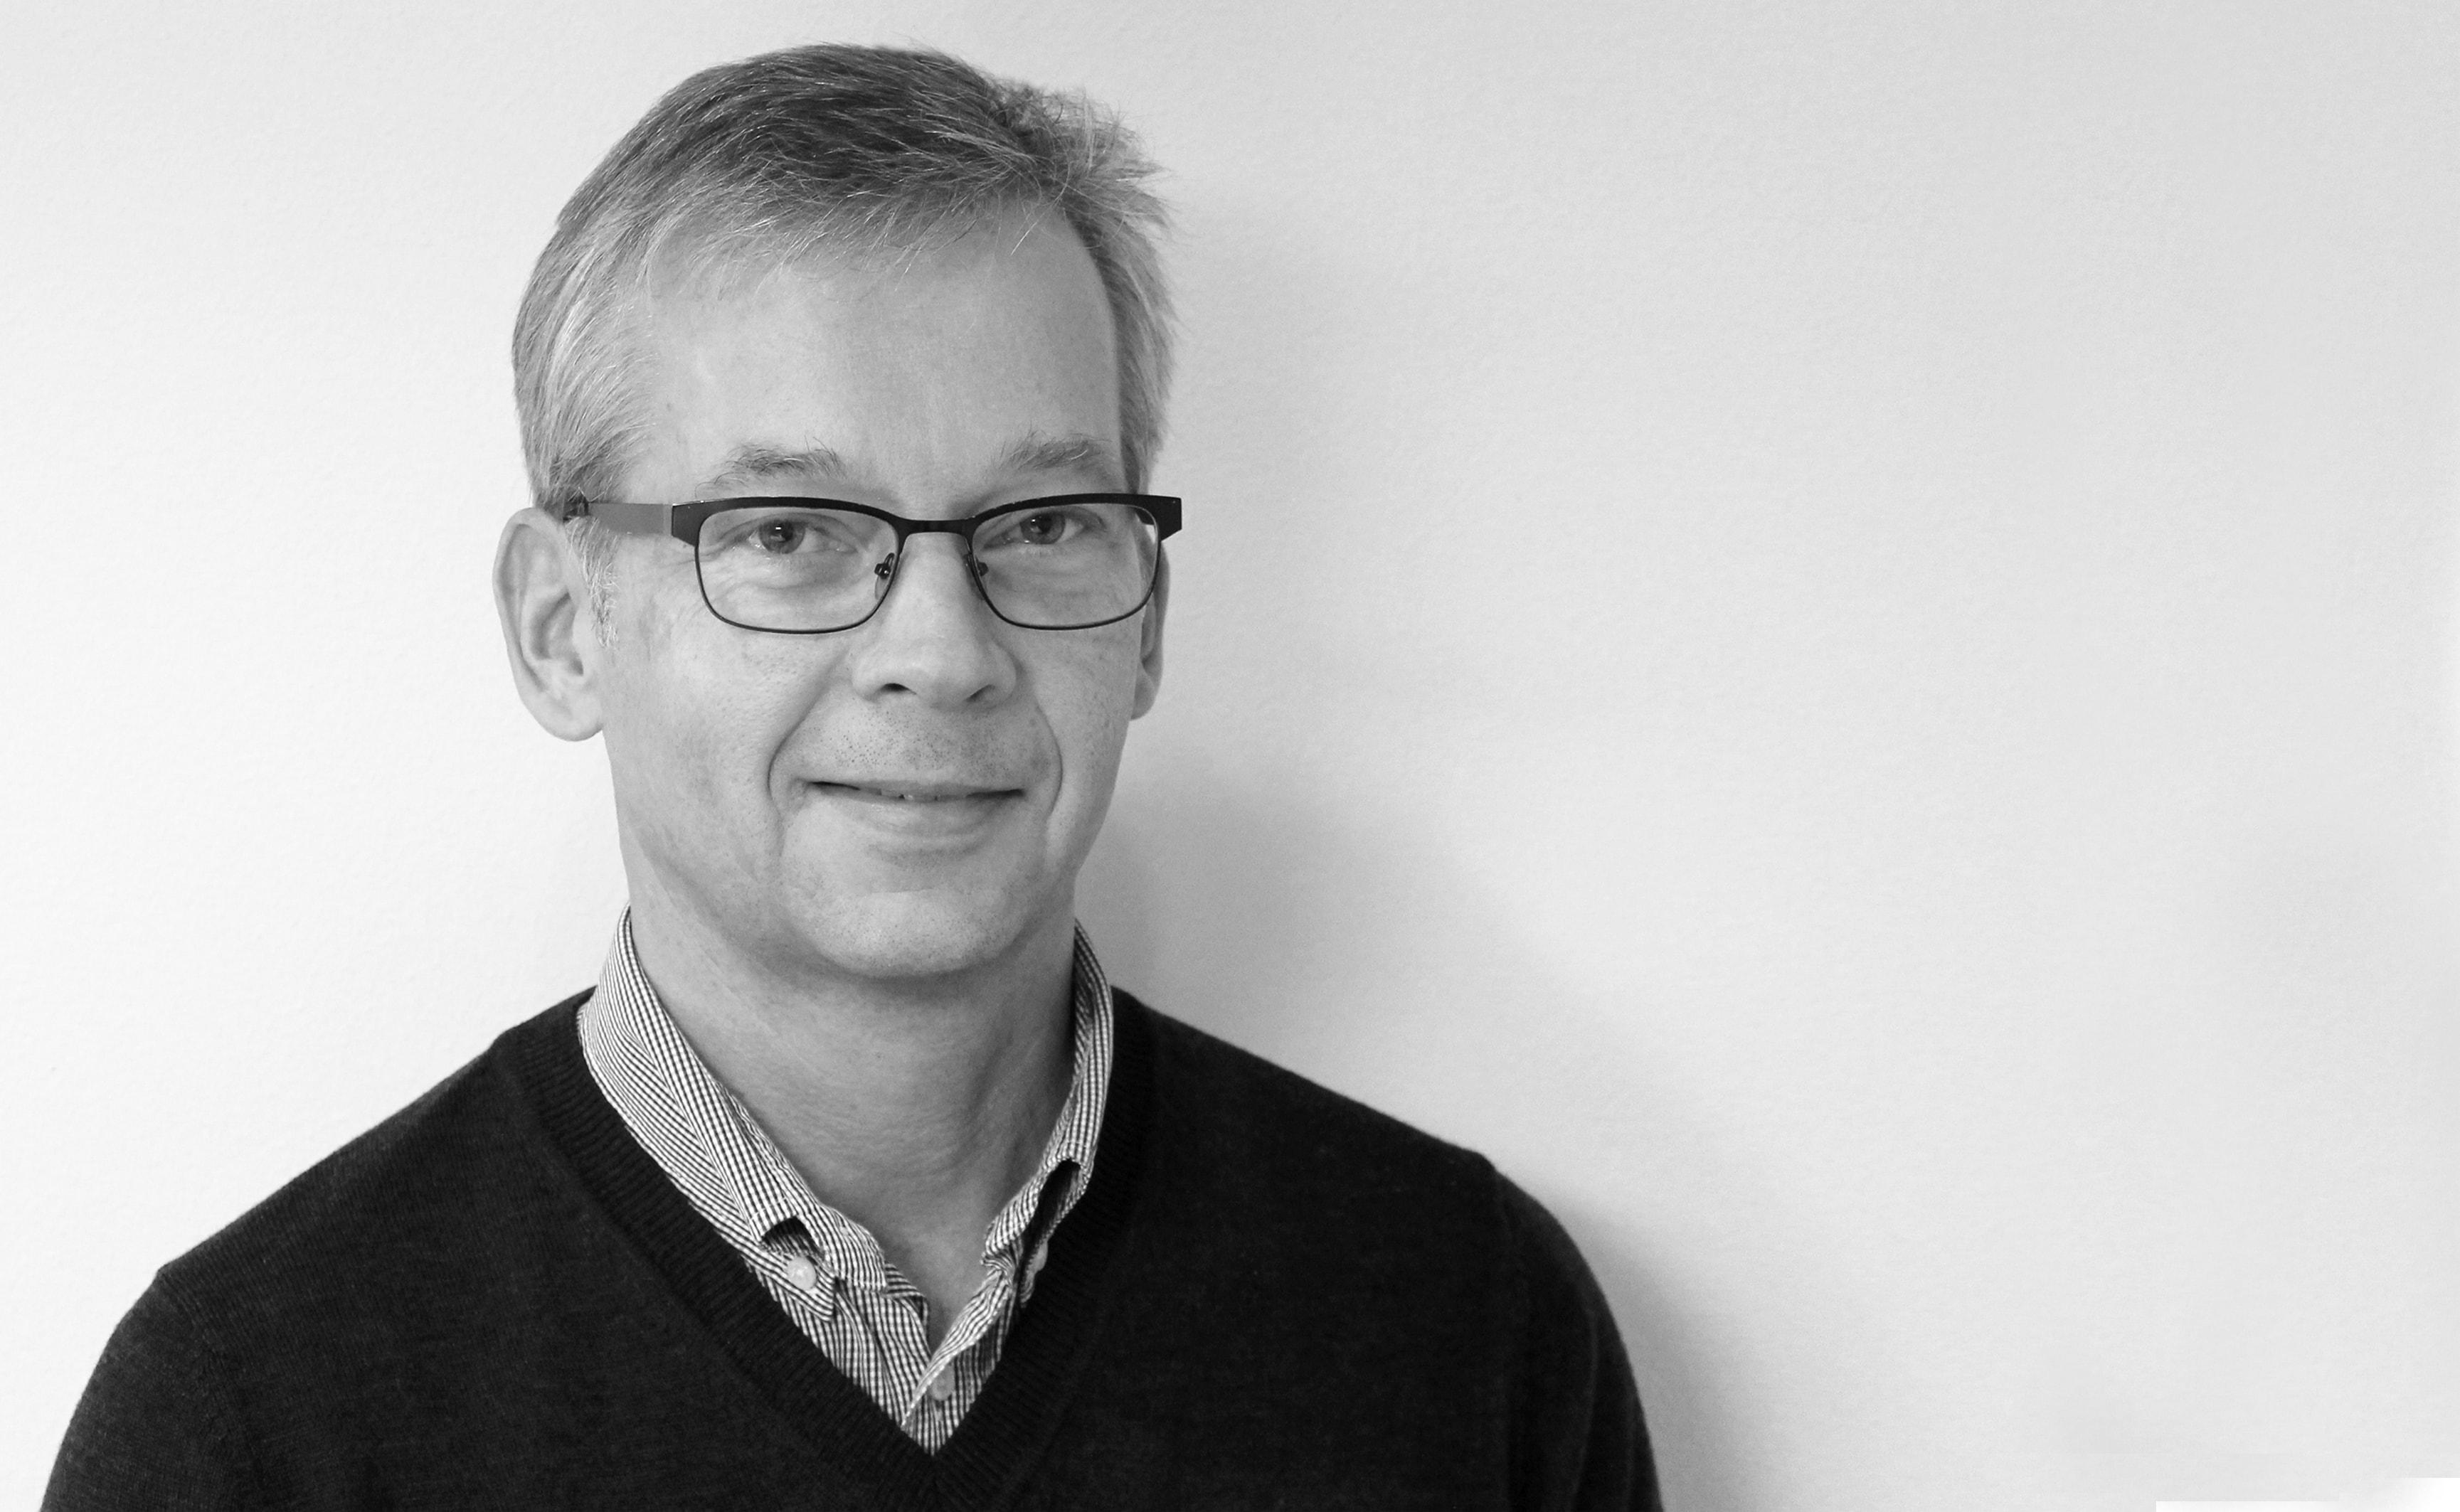 Torleif Olsson